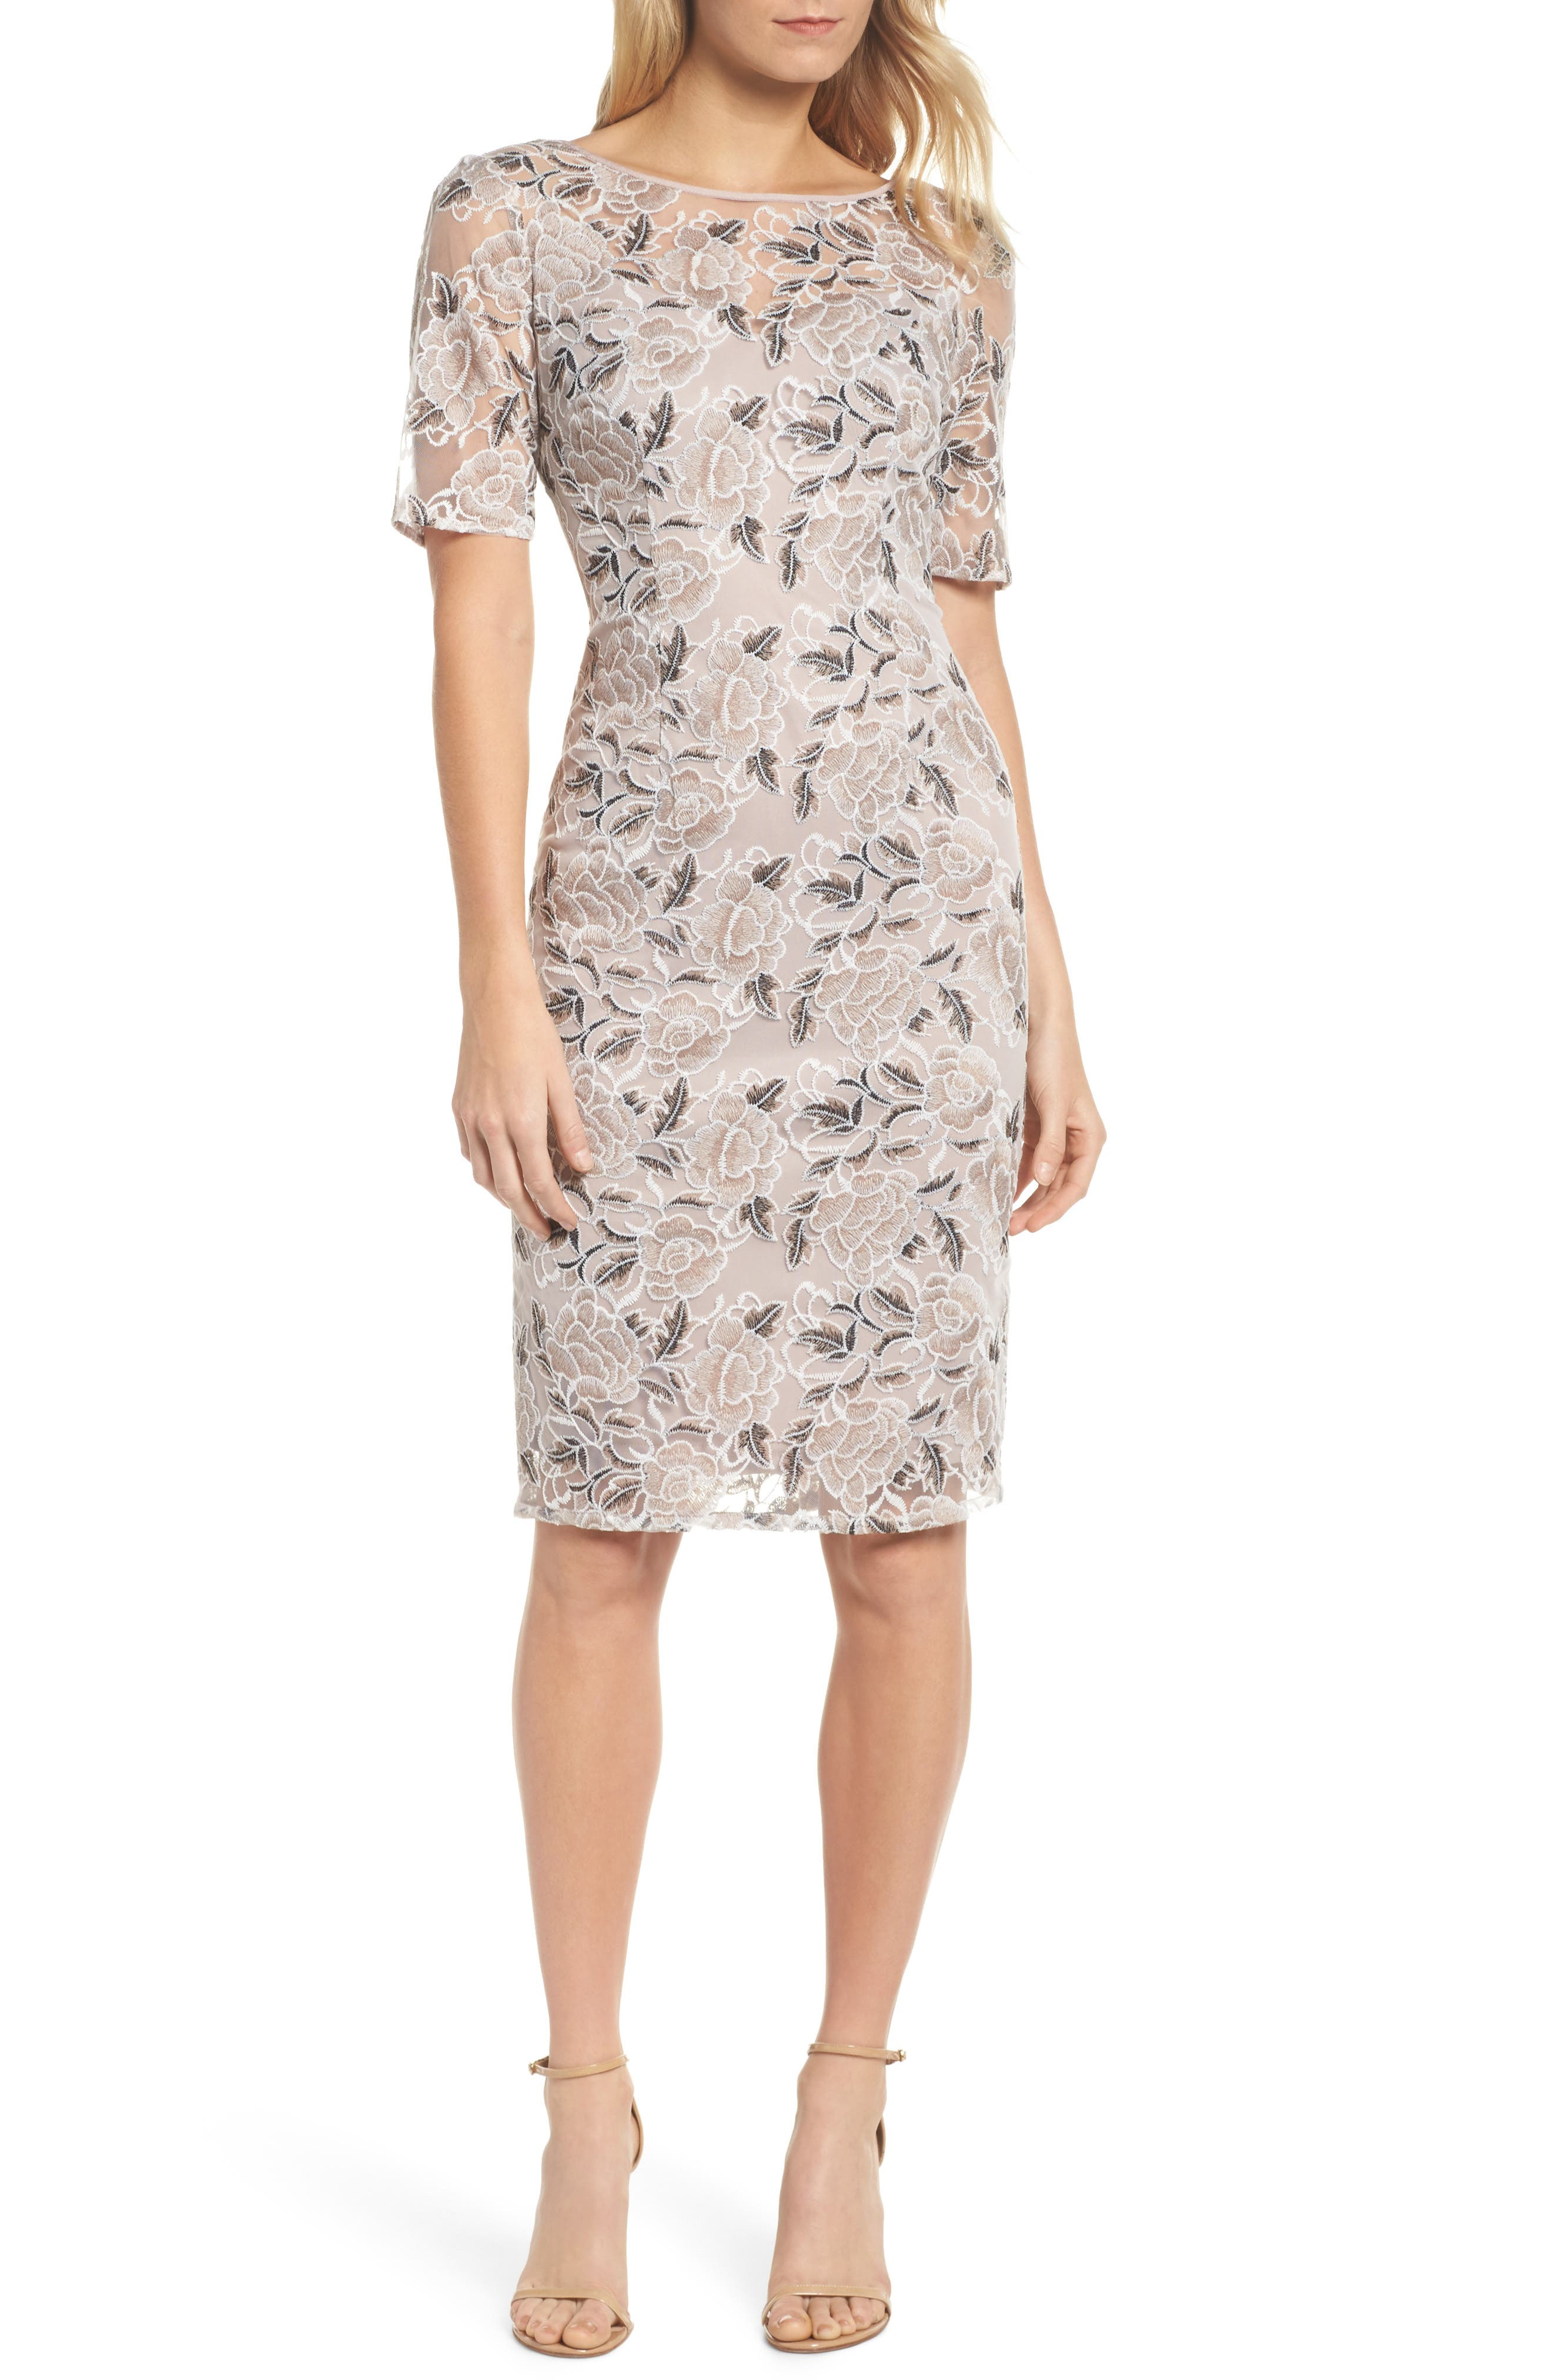 Suzette Embroidered Sheath Dress,                         Main,                         color,